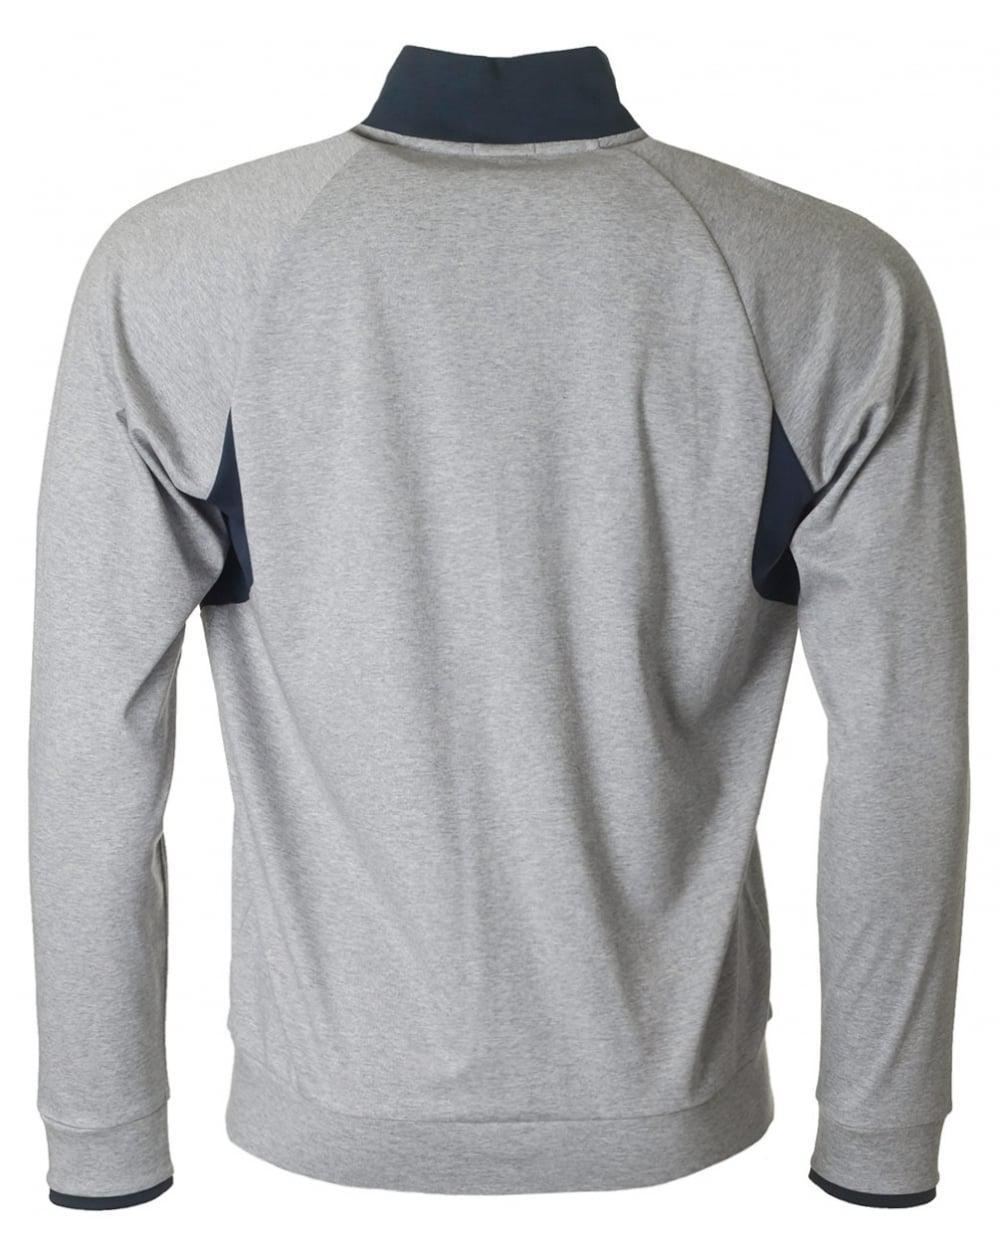 Lyst - Boss Athleisure Salvar Interlock Zip Through Sweat in Gray for Men 7d67a8af37b4